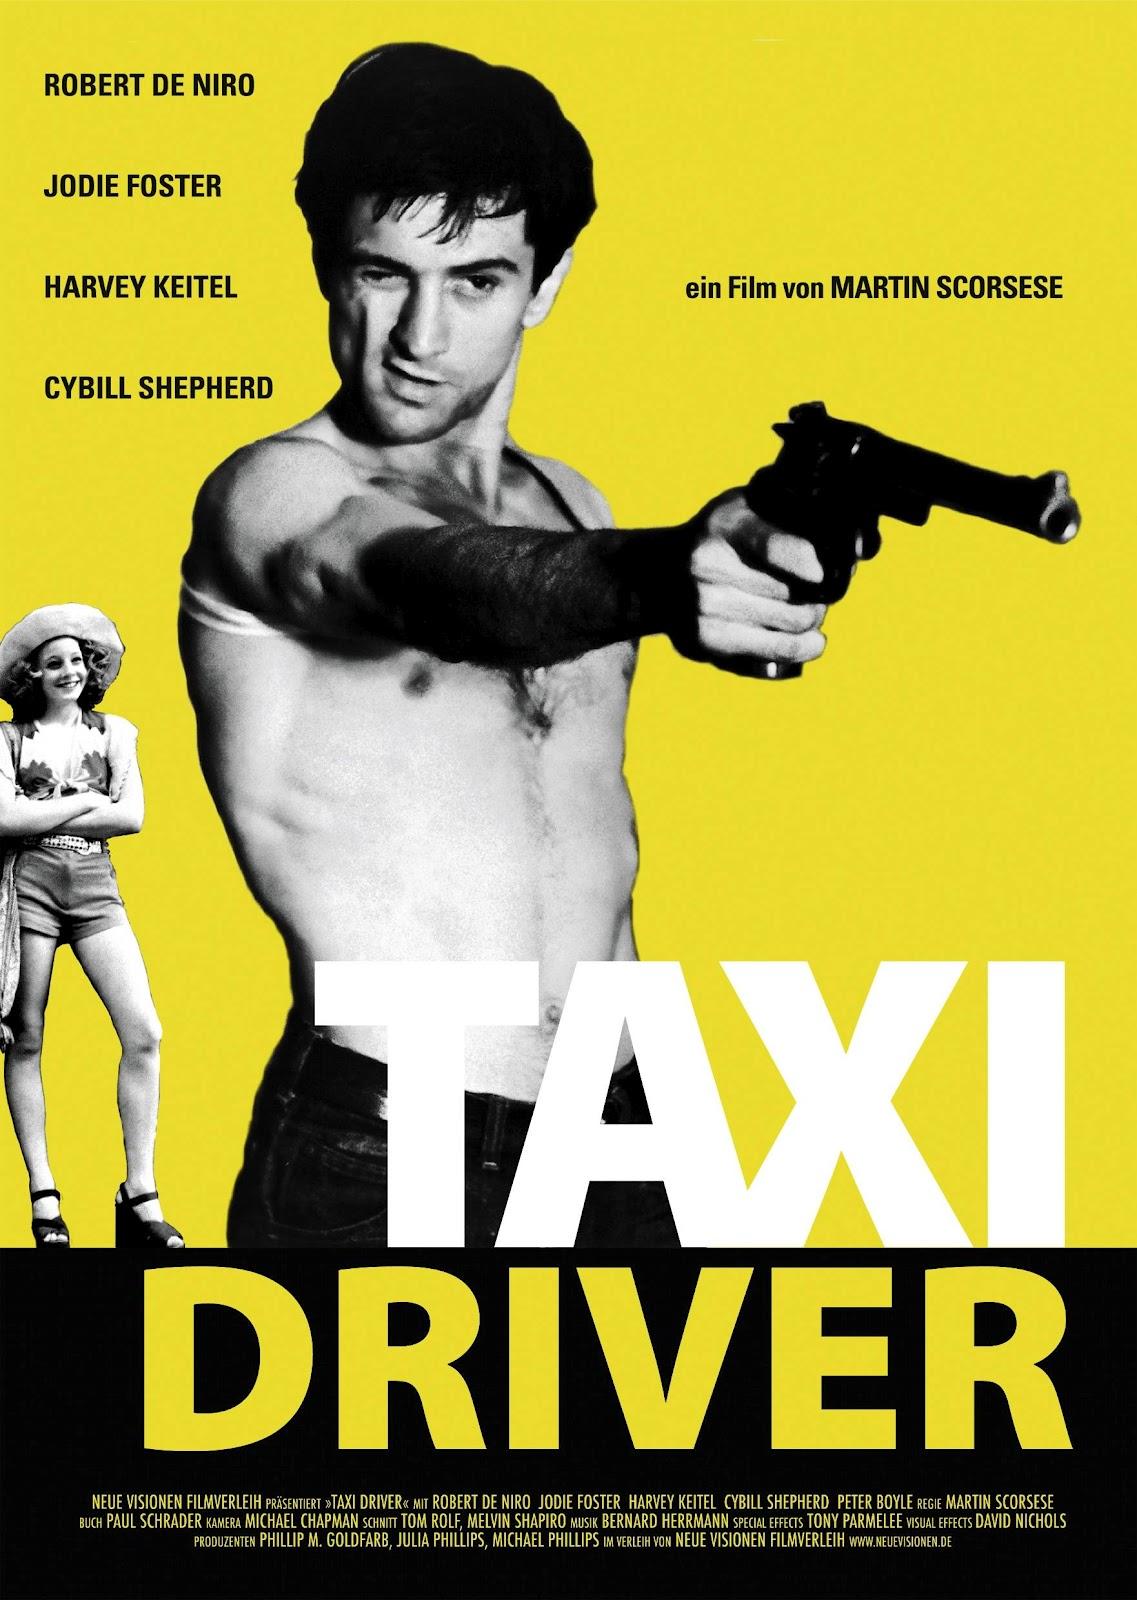 http://4.bp.blogspot.com/-onfFcd-BVC4/T2hpw2KCEJI/AAAAAAAABjI/7P4c5y2PZ34/s1600/Taxi-Driver.jpg